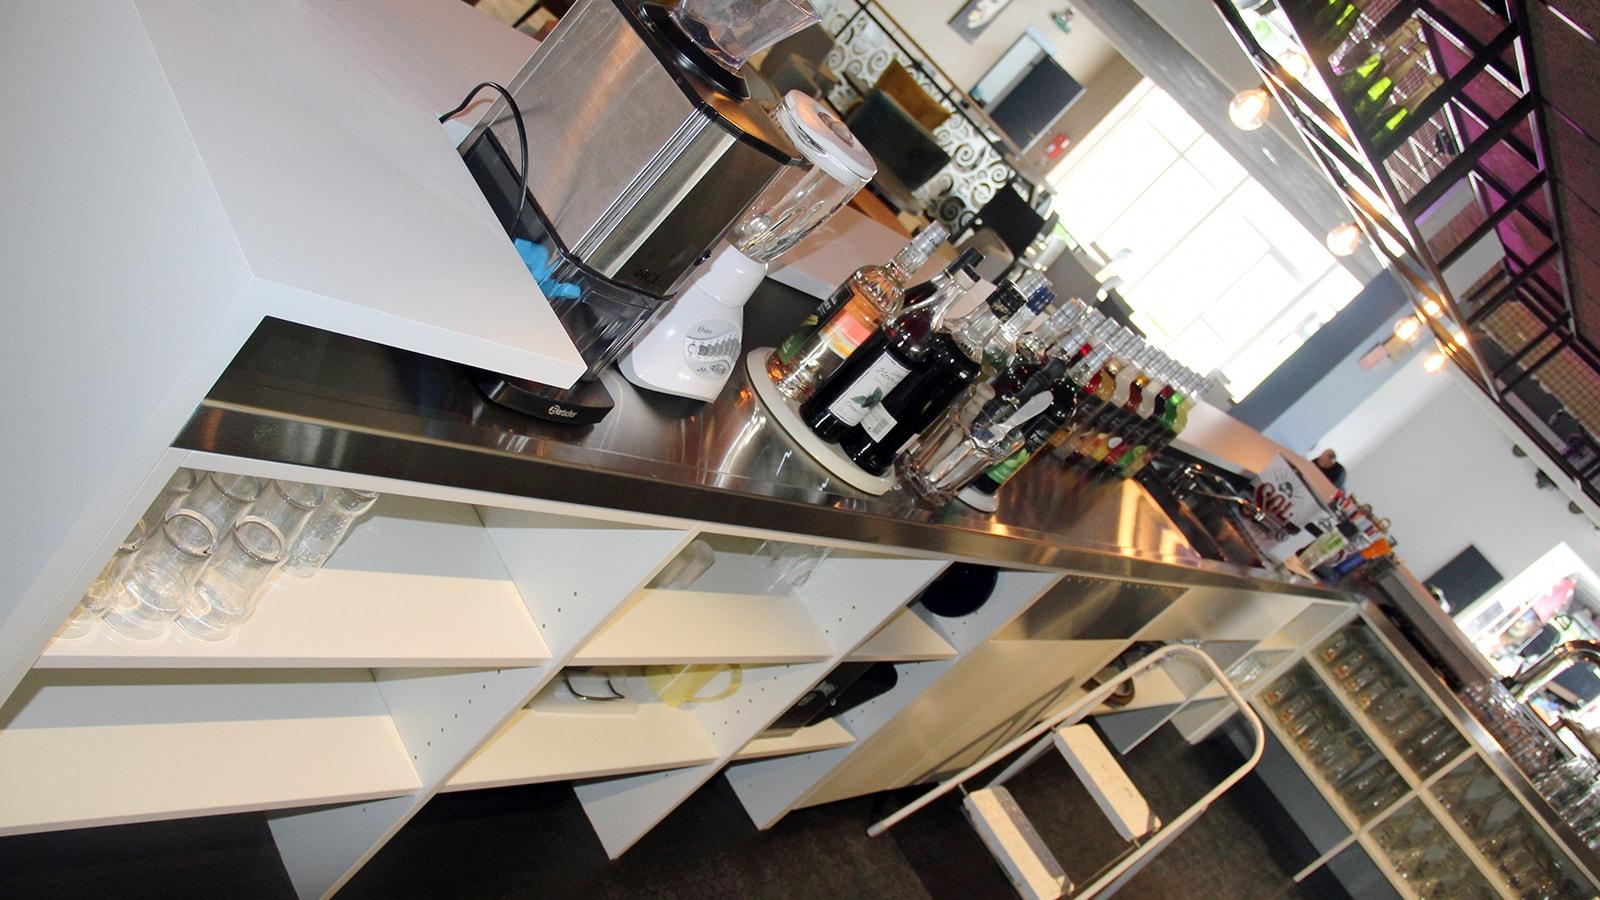 EFI Design Bar Clarys Saint Jean De Monts Efi Design (7) 1216